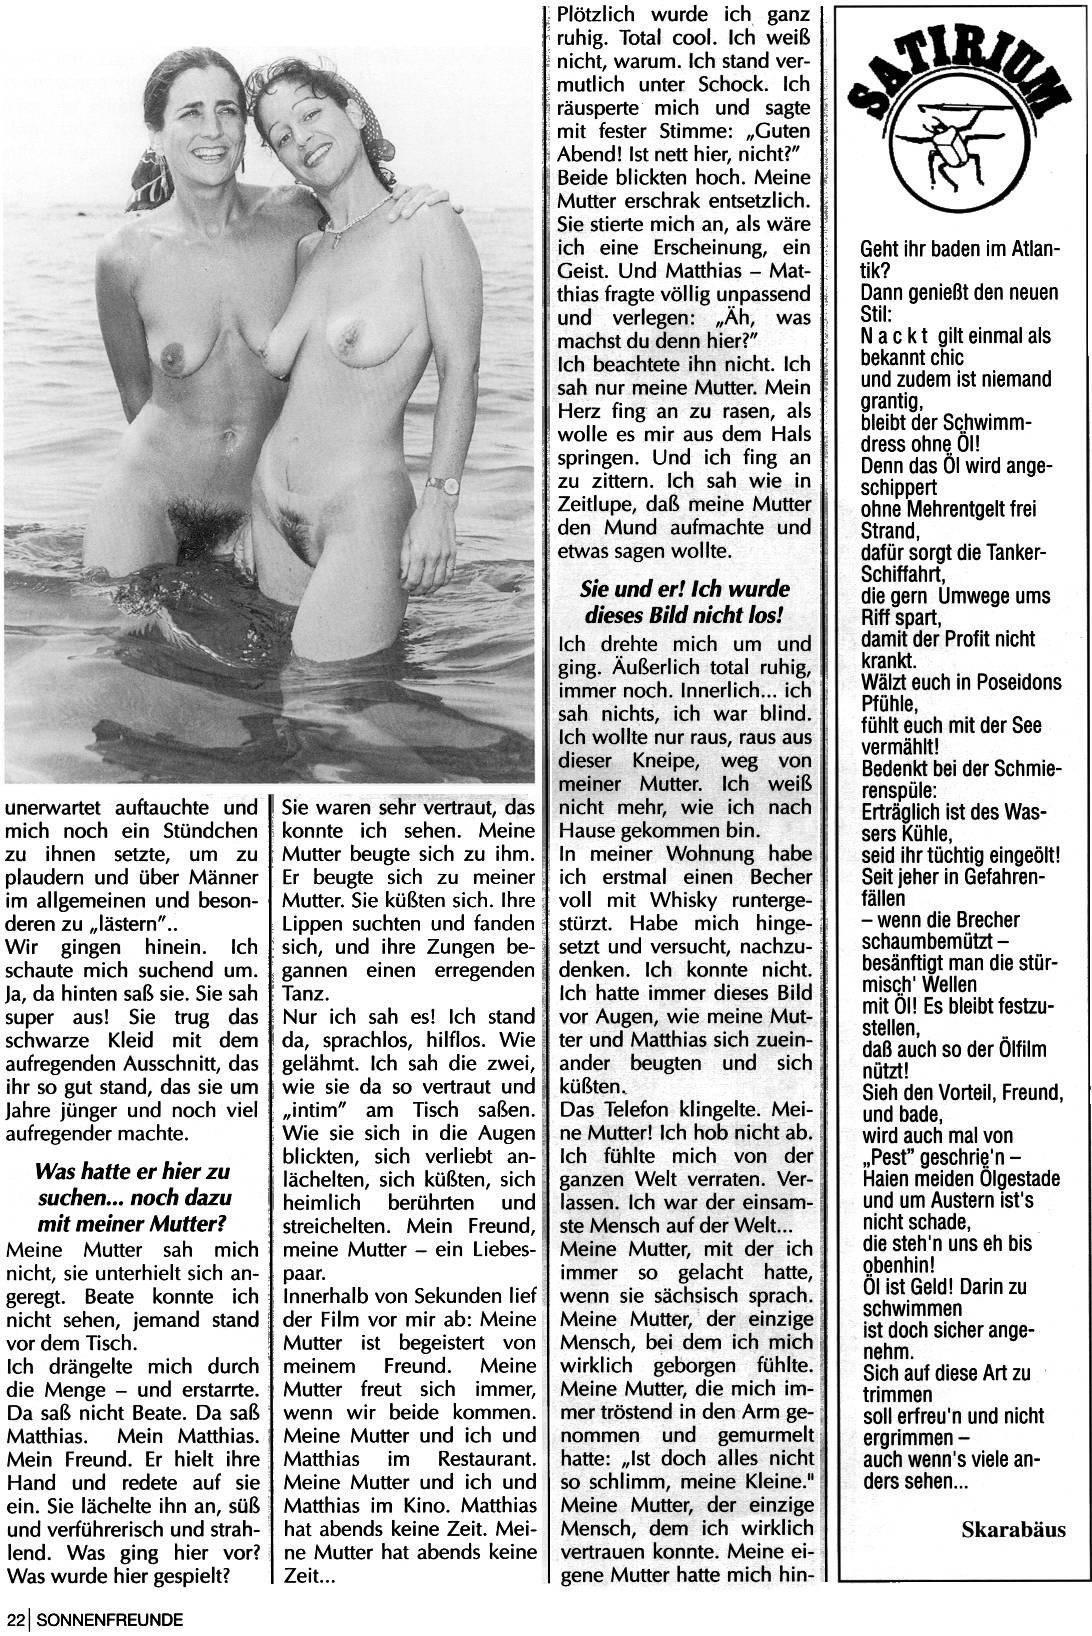 Naturist Magazines Sonnenfreunde 1993 Nr.7 - 1